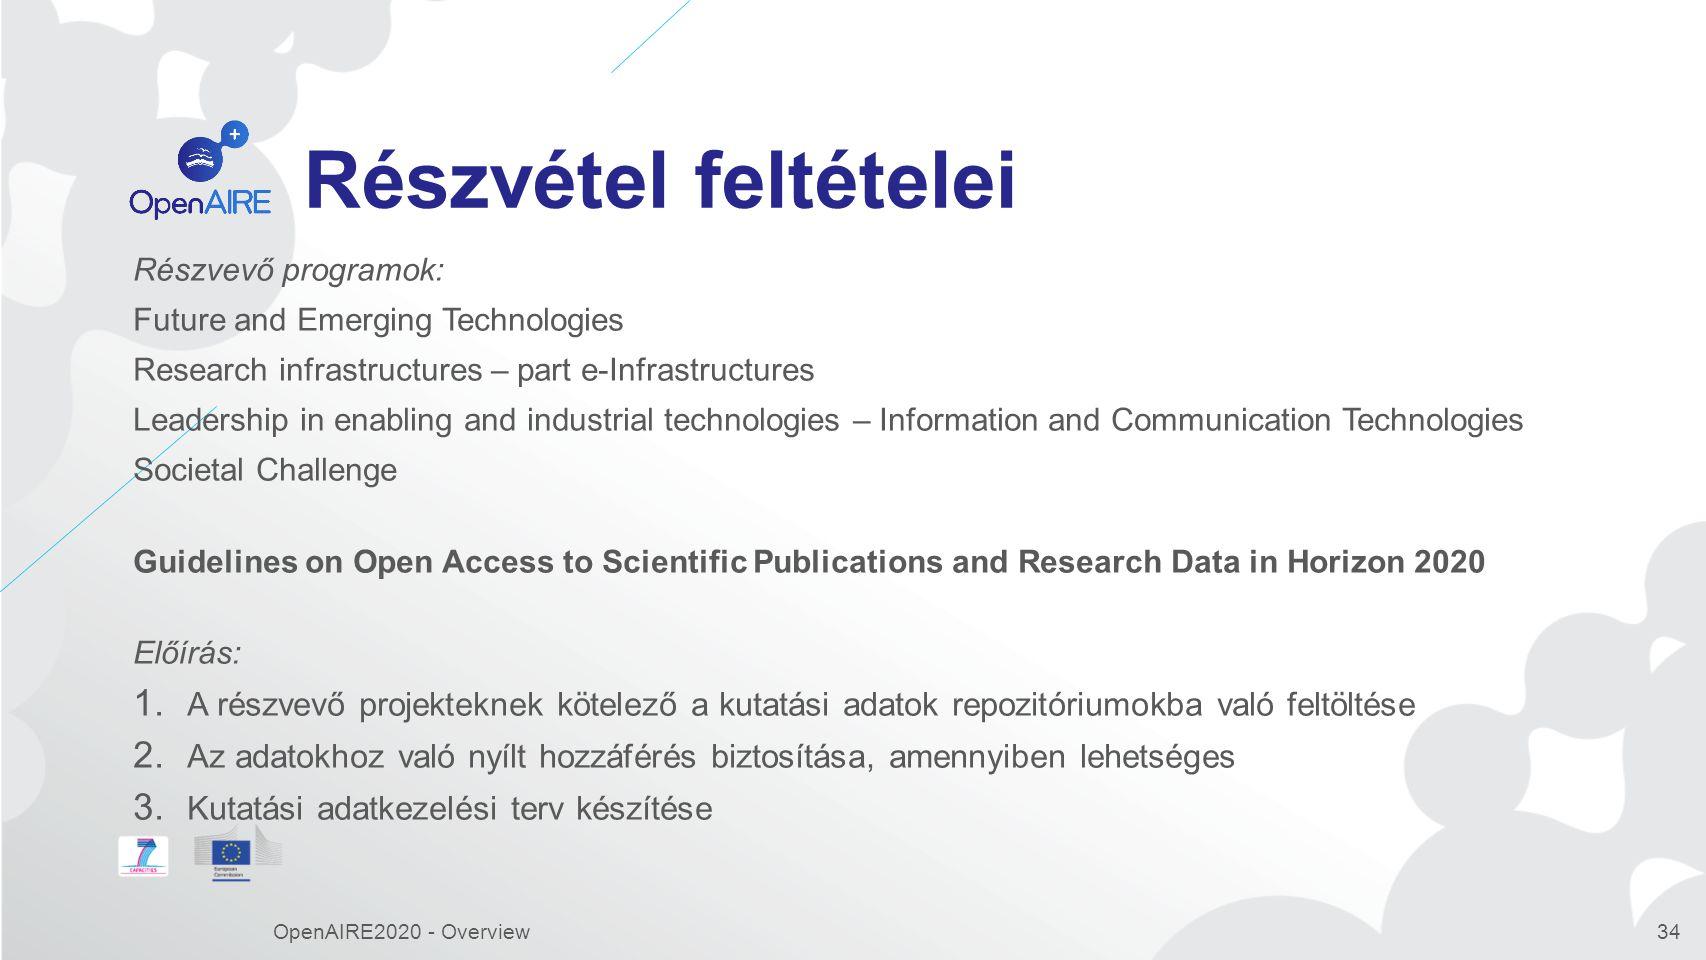 Részvétel feltételei Részvevő programok: Future and Emerging Technologies. Research infrastructures – part e-Infrastructures.